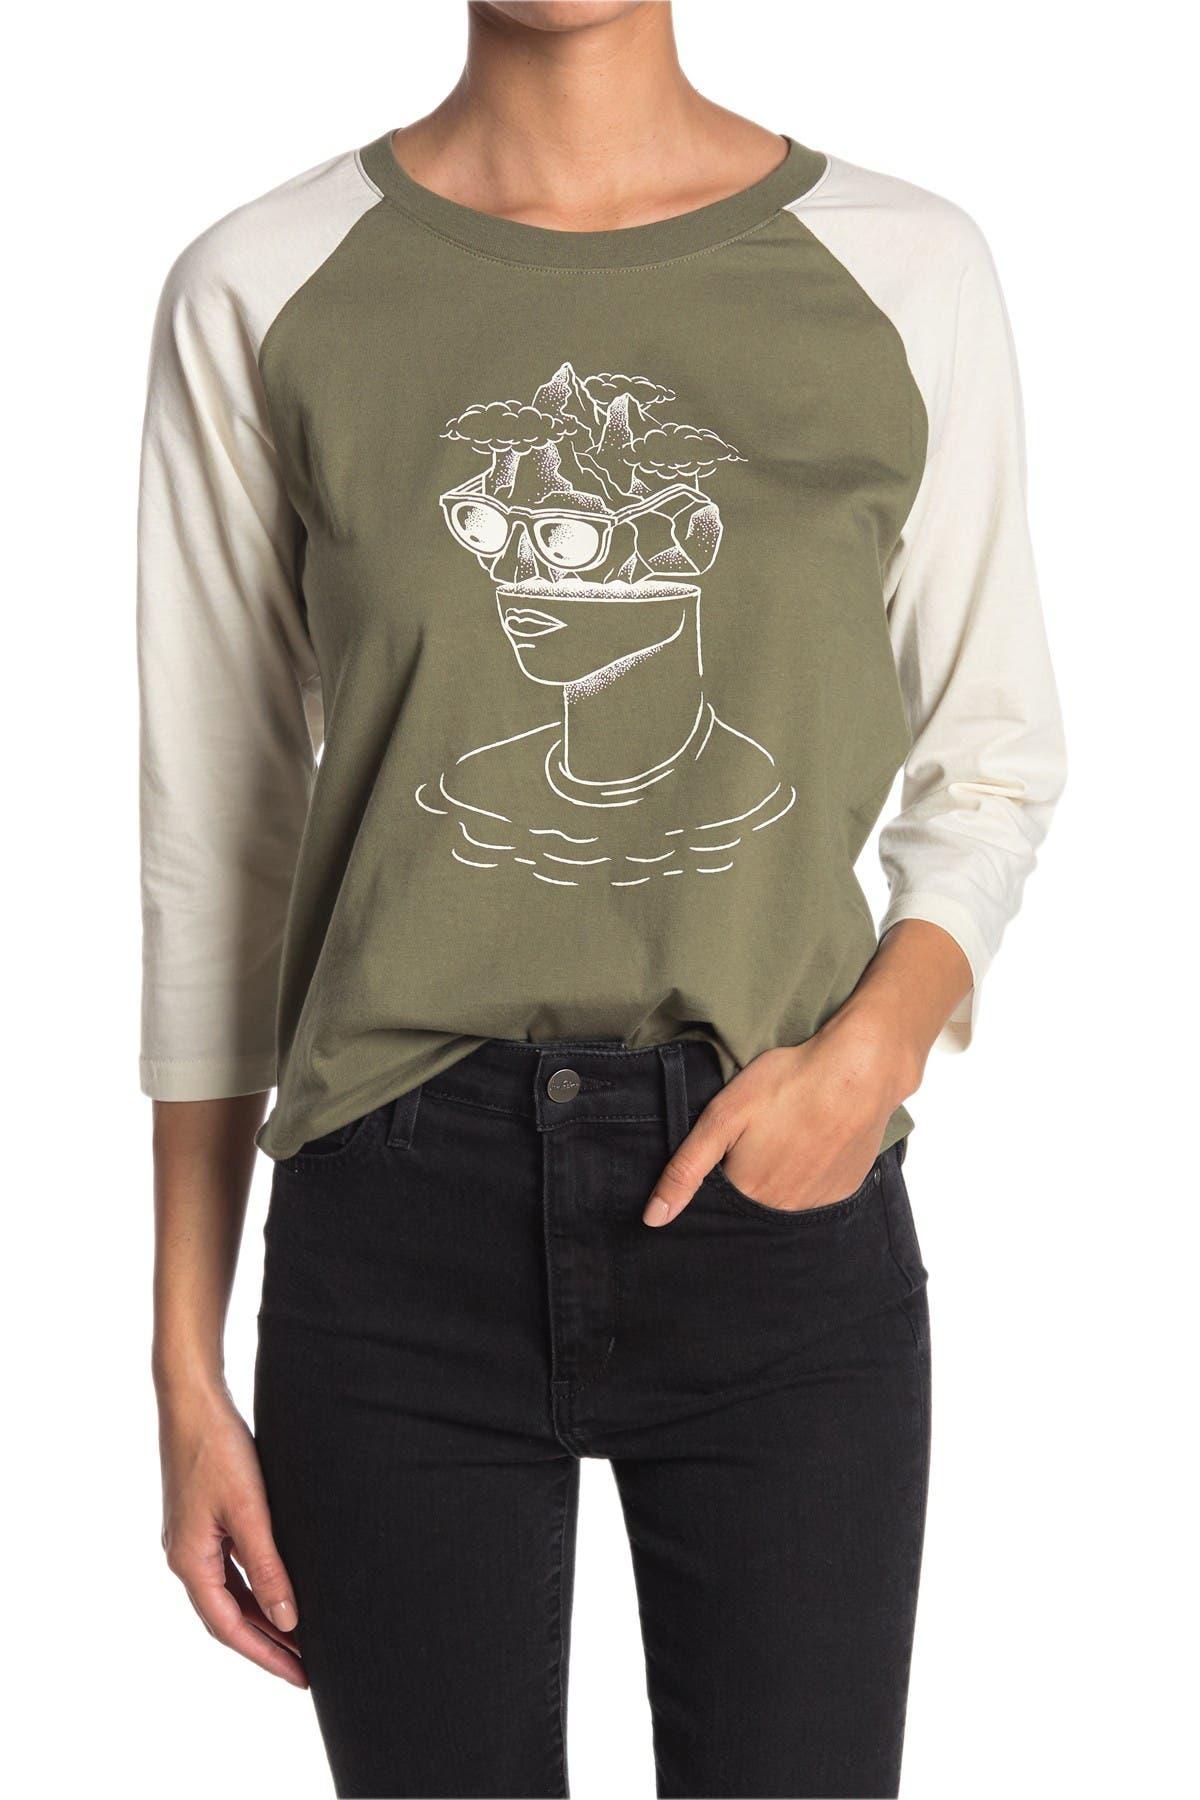 Image of MOUNTAIN HARDWEAR Head in the Clouds 3/4 Raglan Sleeve Organic Cotton T-Shirt